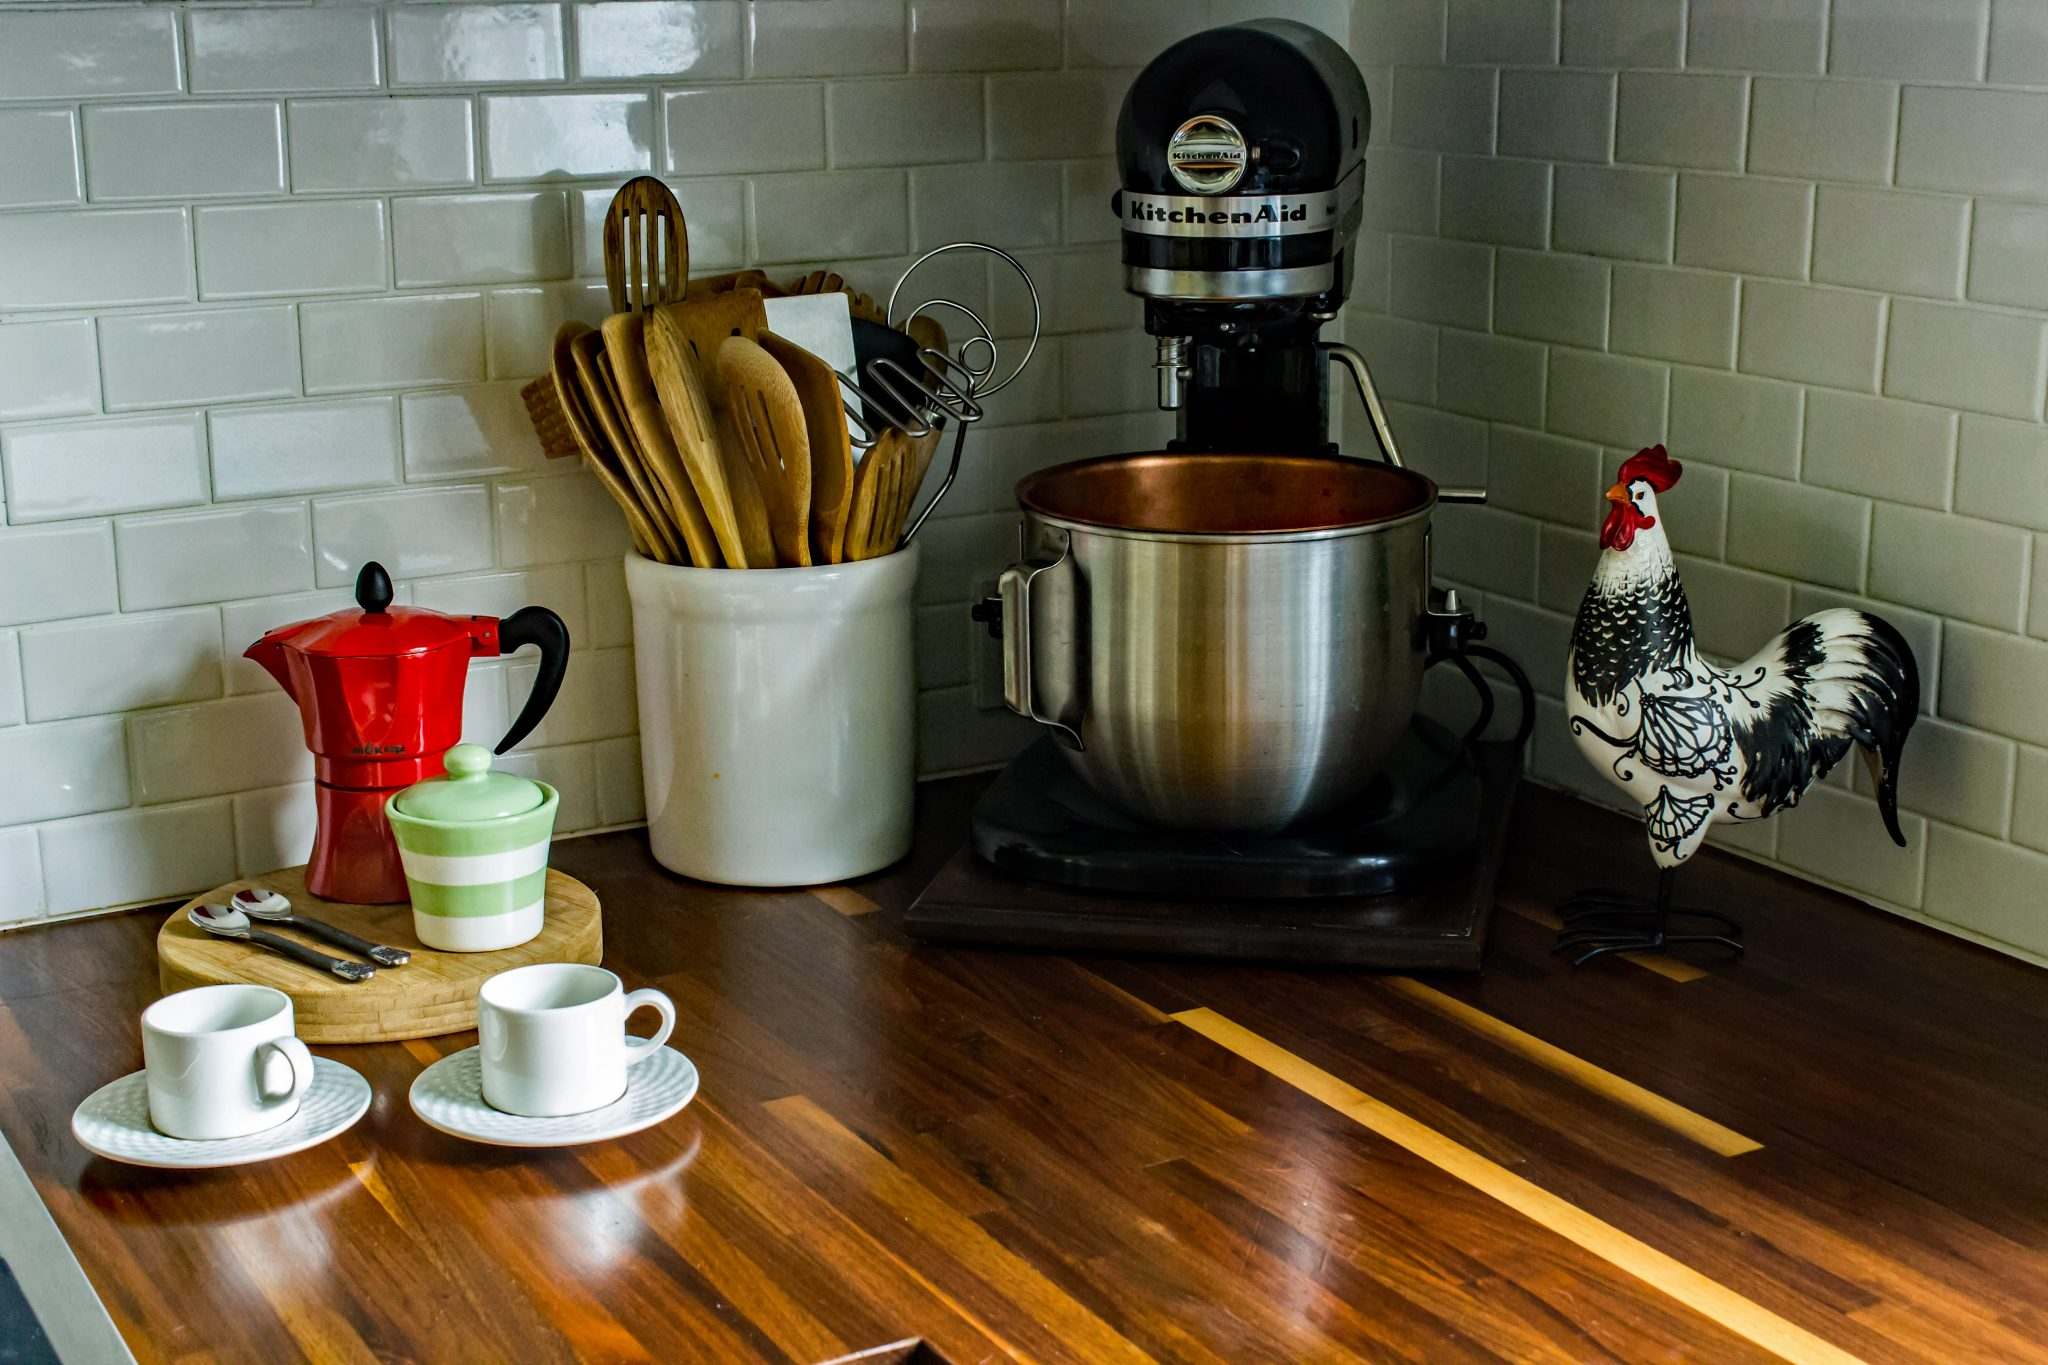 Solution for sliding your heavy Kitchenaid mixer